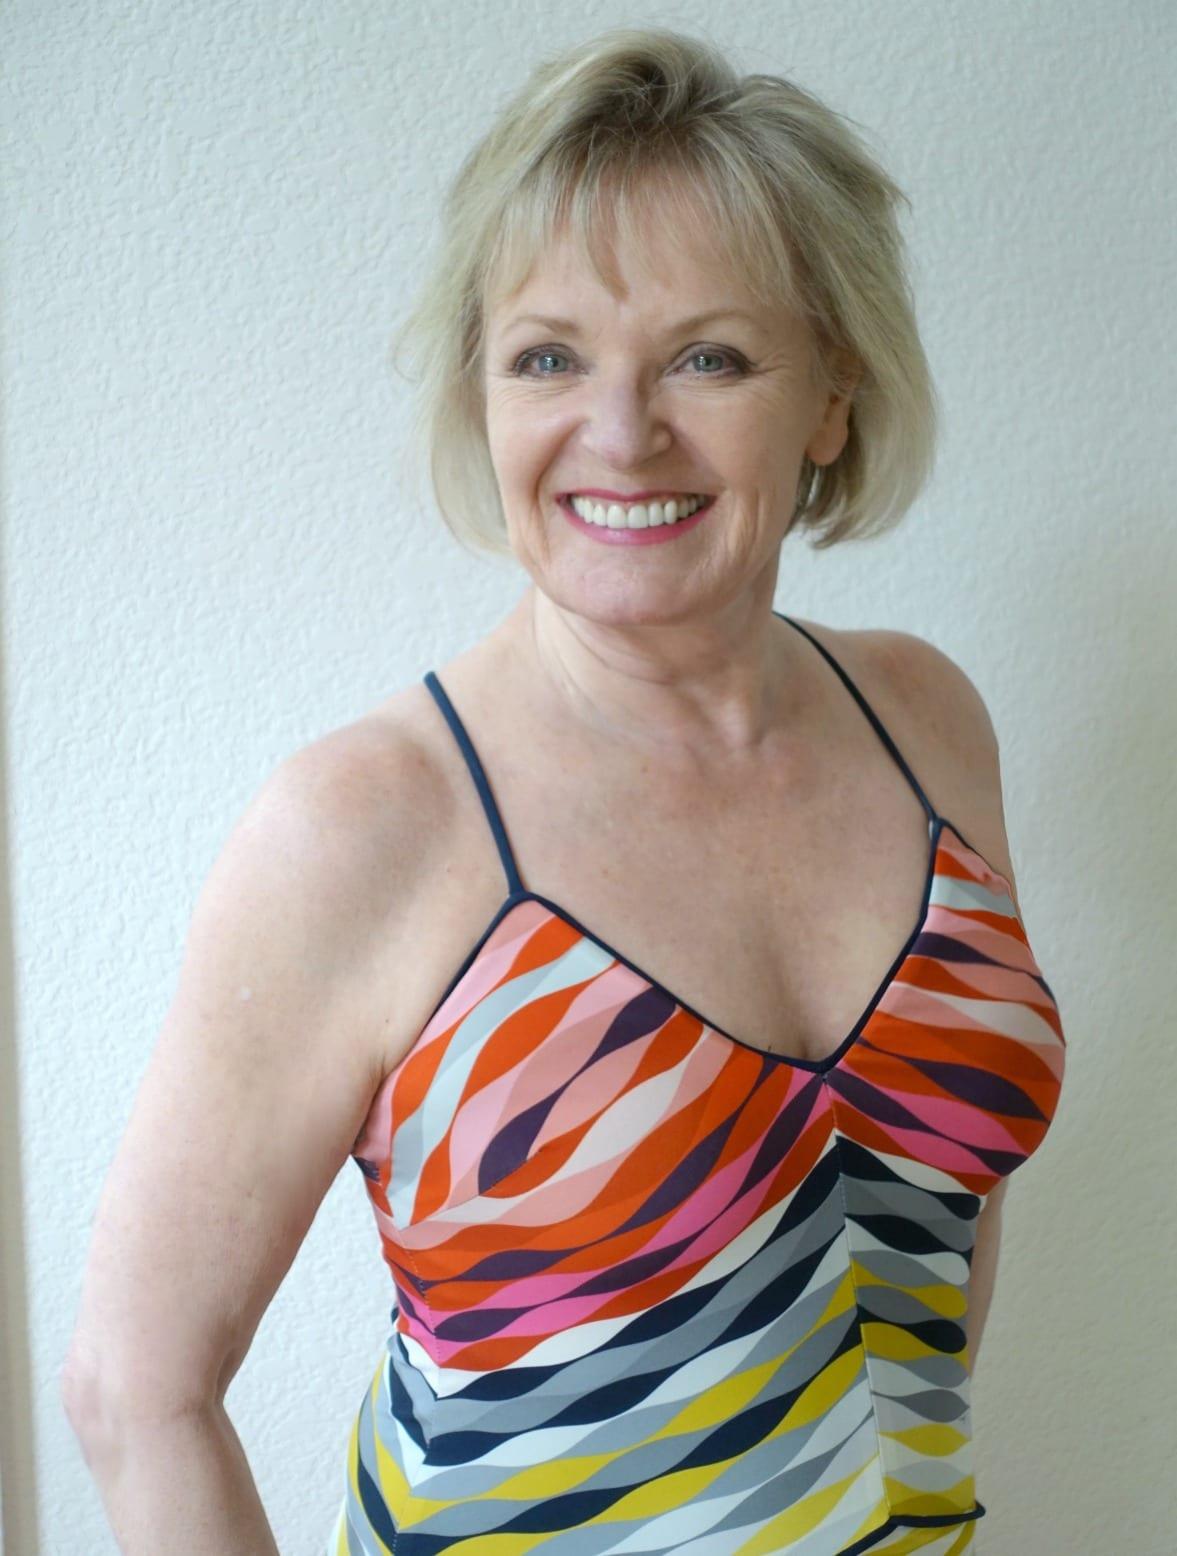 soma vanishing strapless bra under a dress with spaghetti straps